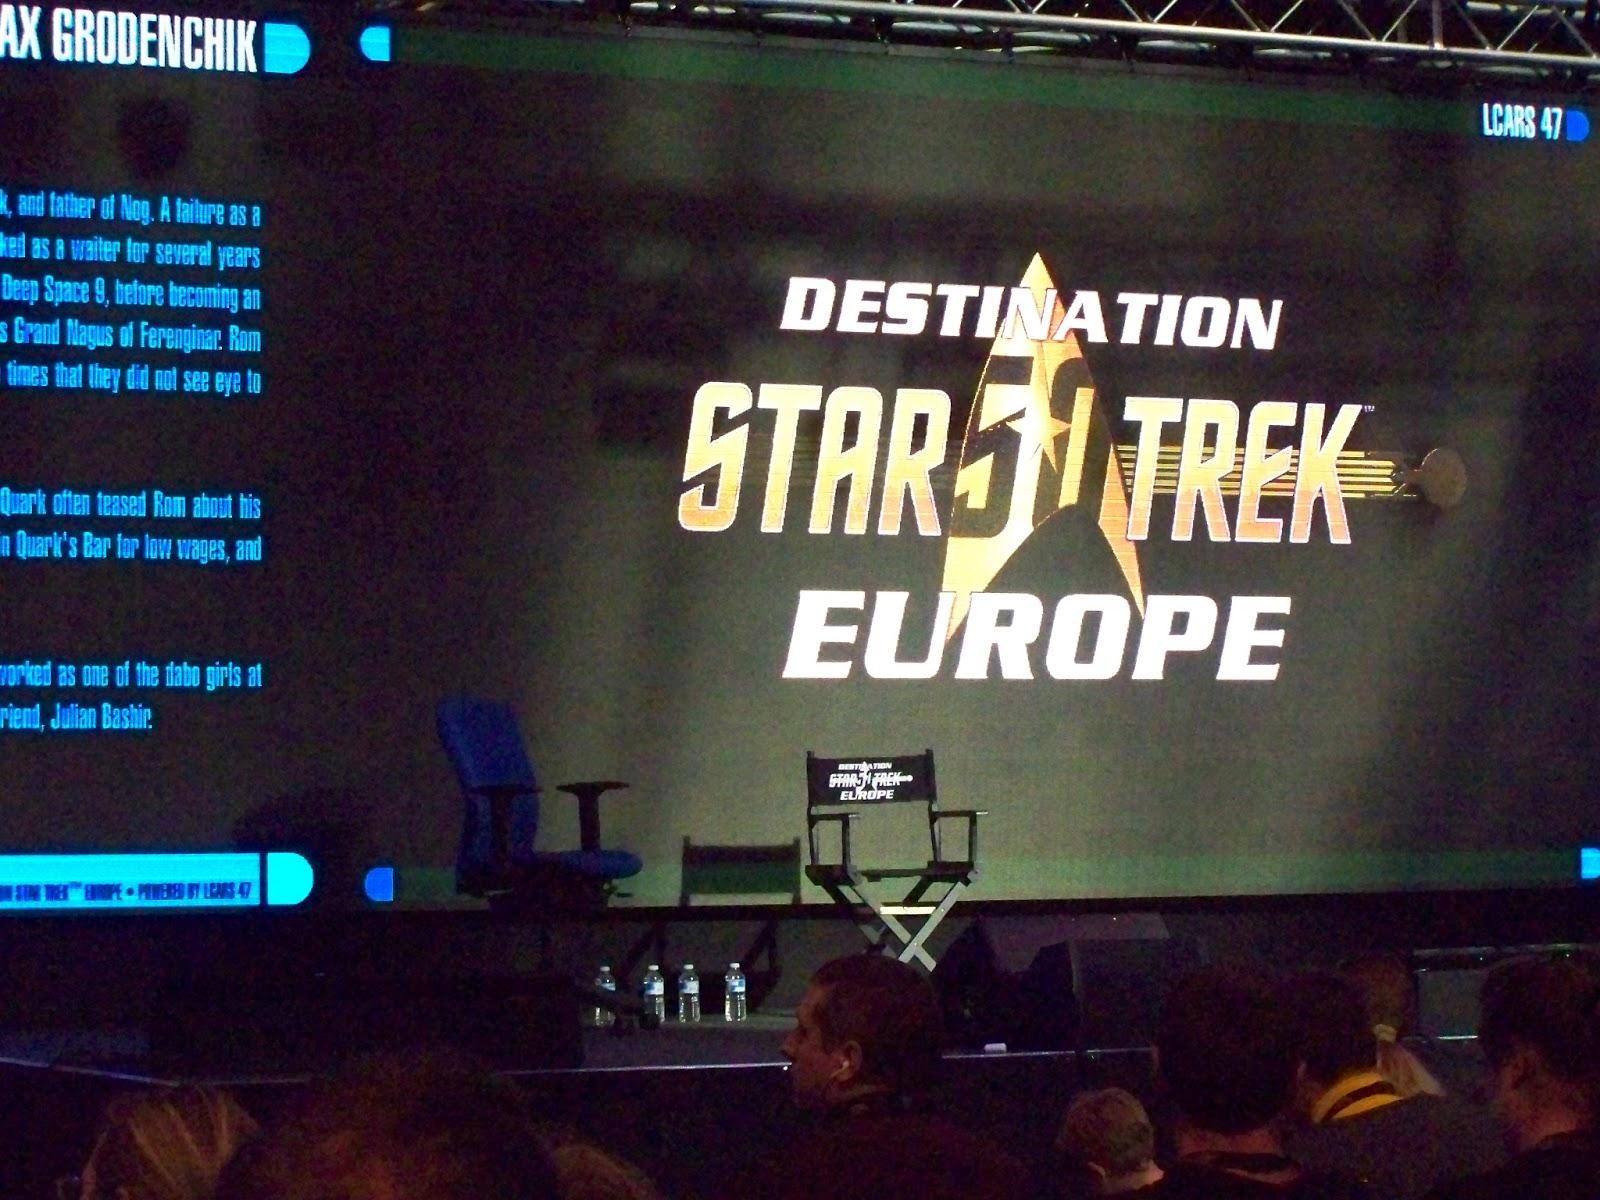 Concert Reviews: Destination Star Trek 50 Europe